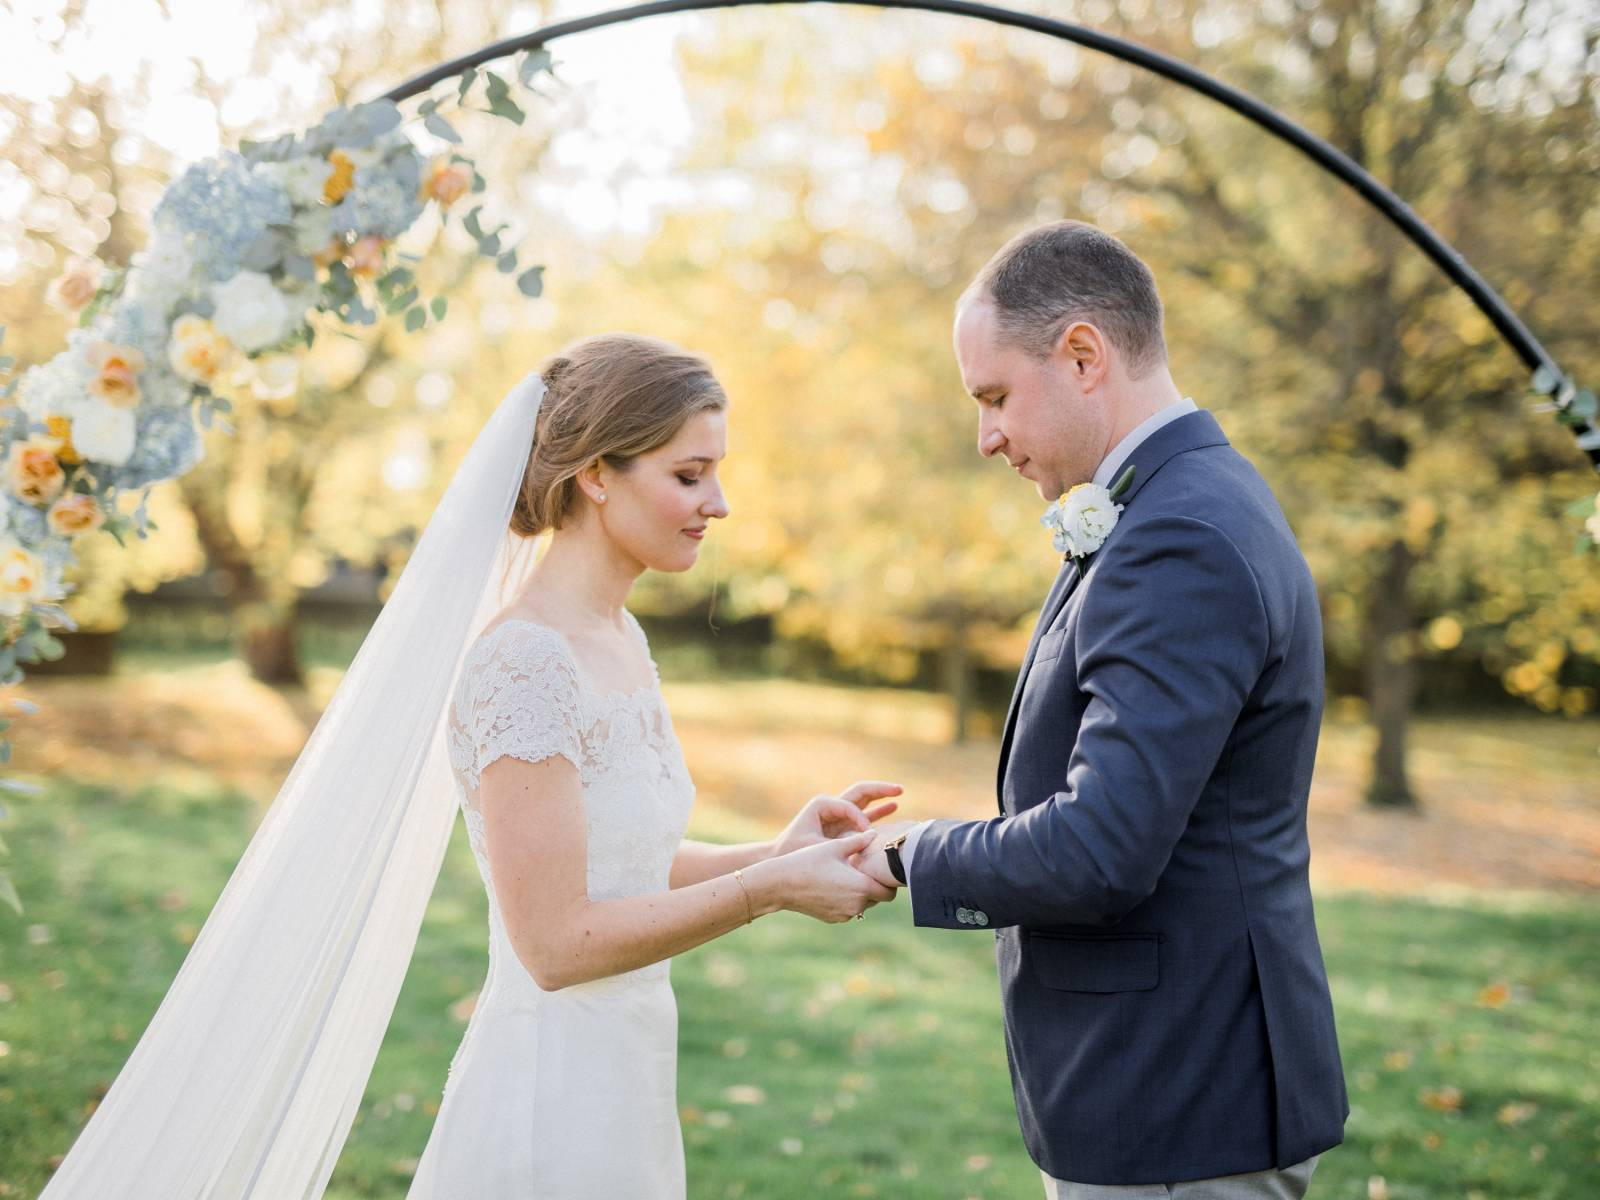 Elisabeth Van Lent Fine Art Wedding Photography - Ferme de Balingue wedding-13